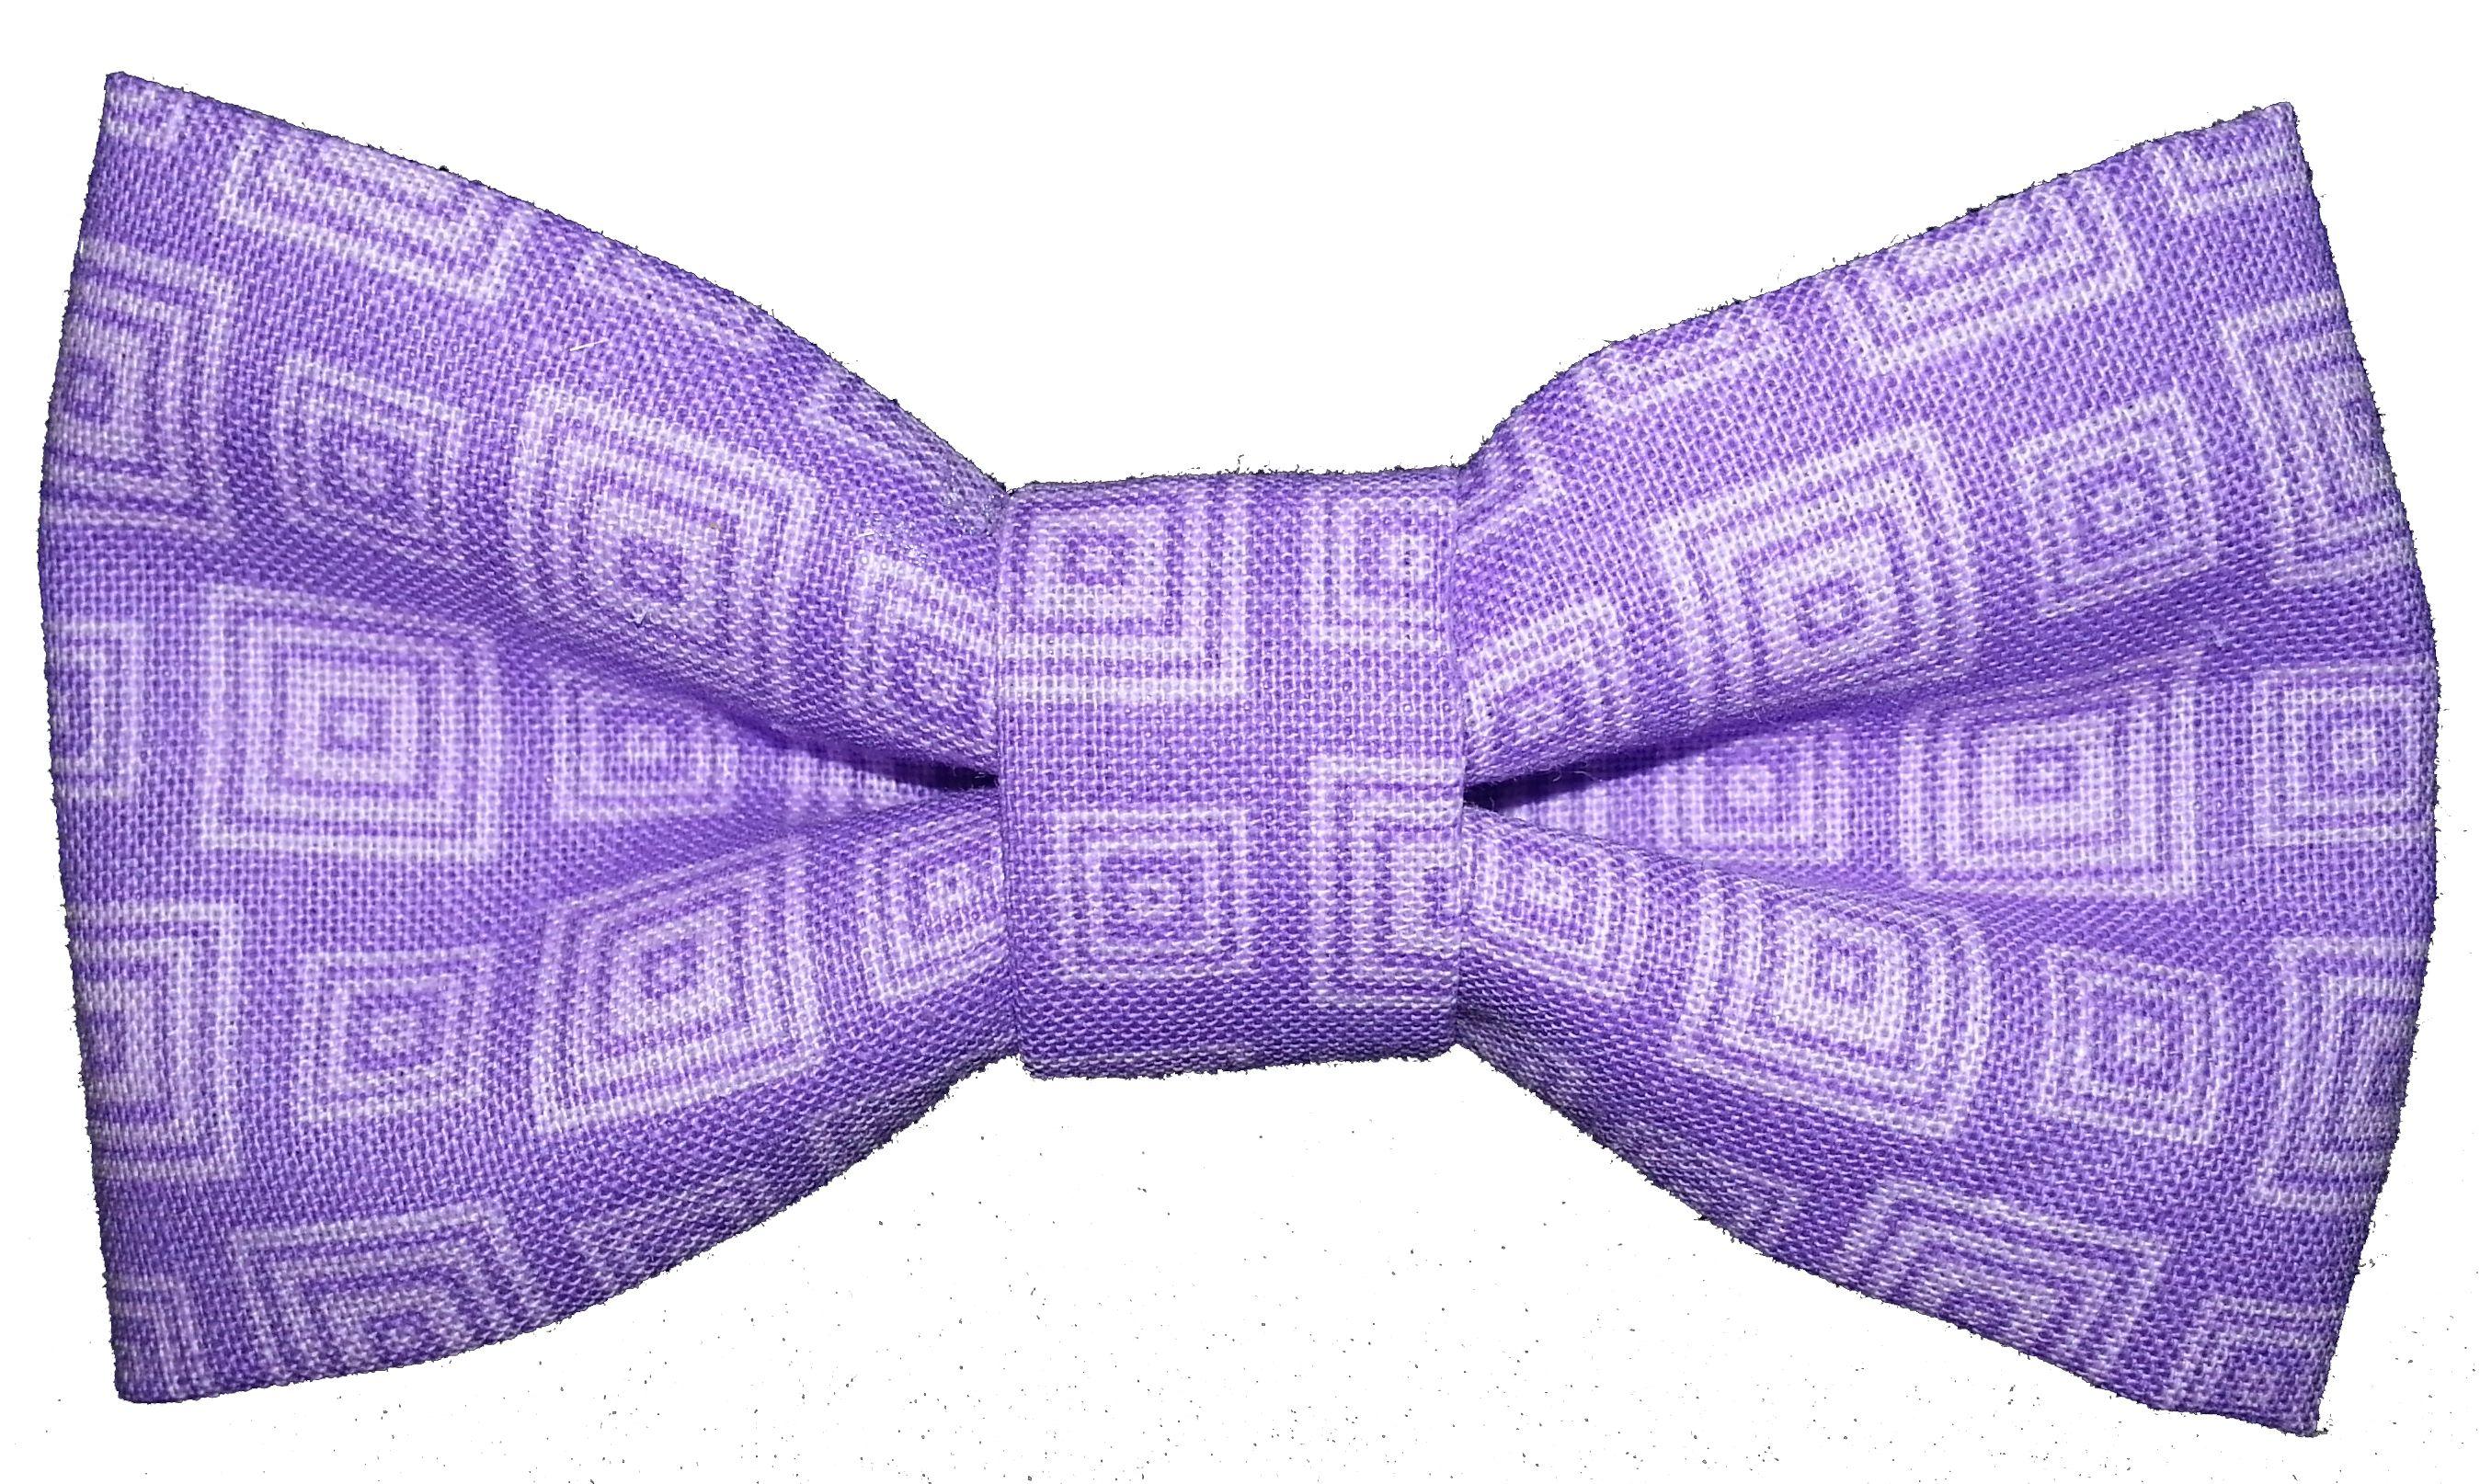 Singe Purple square pattern dog bowtie #dogbowtique #dog #bowtie #bow #dogbow #dogboutique #tie www.dogbowtique.com www.shop.dowbowtique.com www.facebook.com/dogbowtique